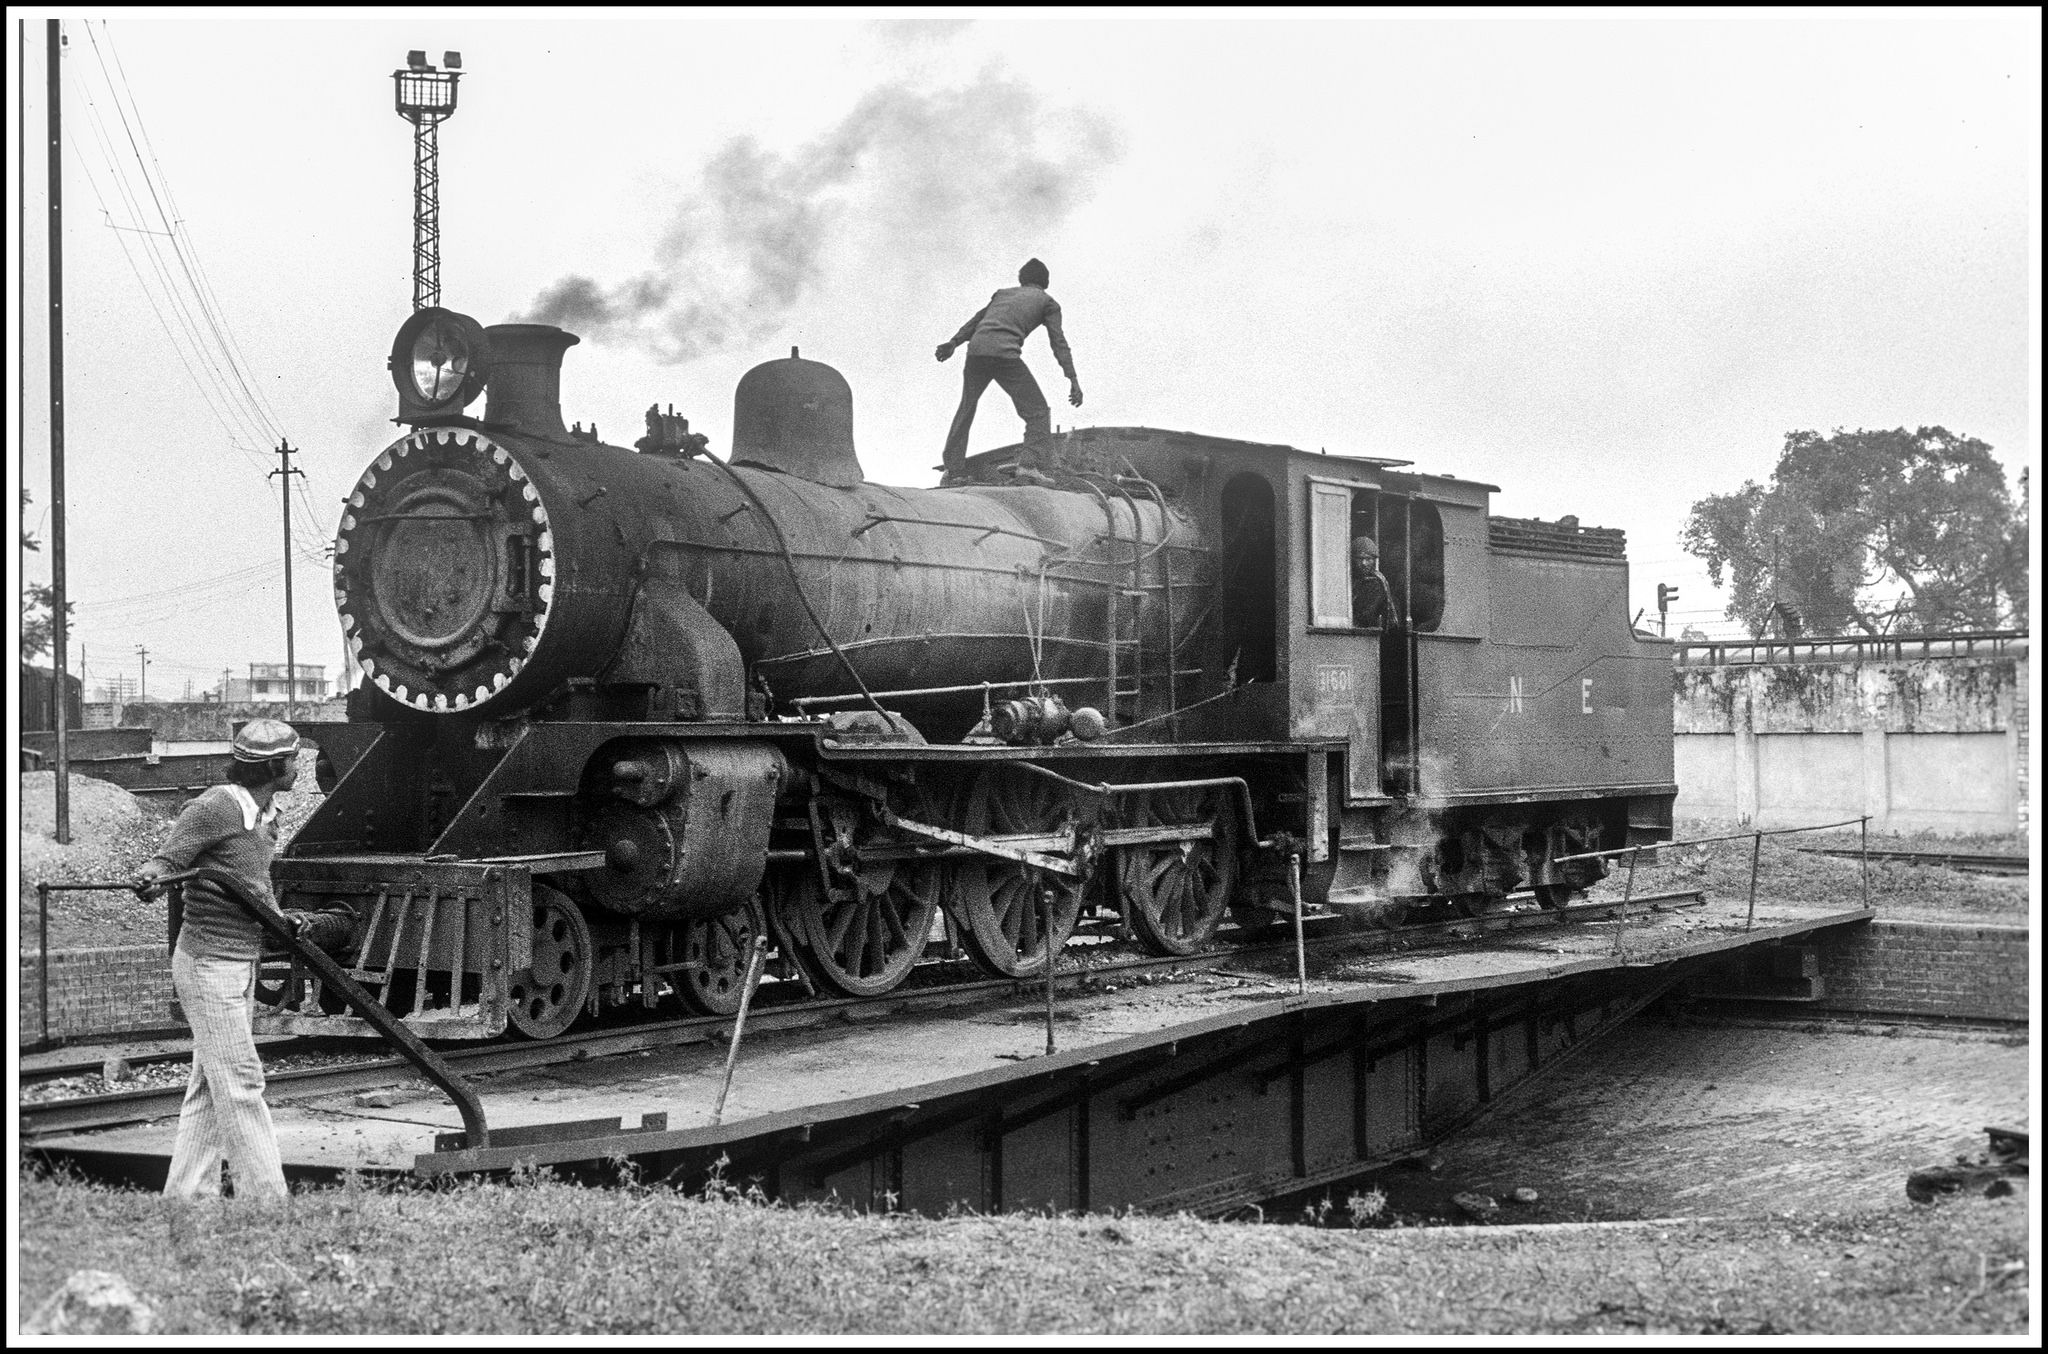 Image74b in 2020 | Dream vacations, Steam locomotive, Train